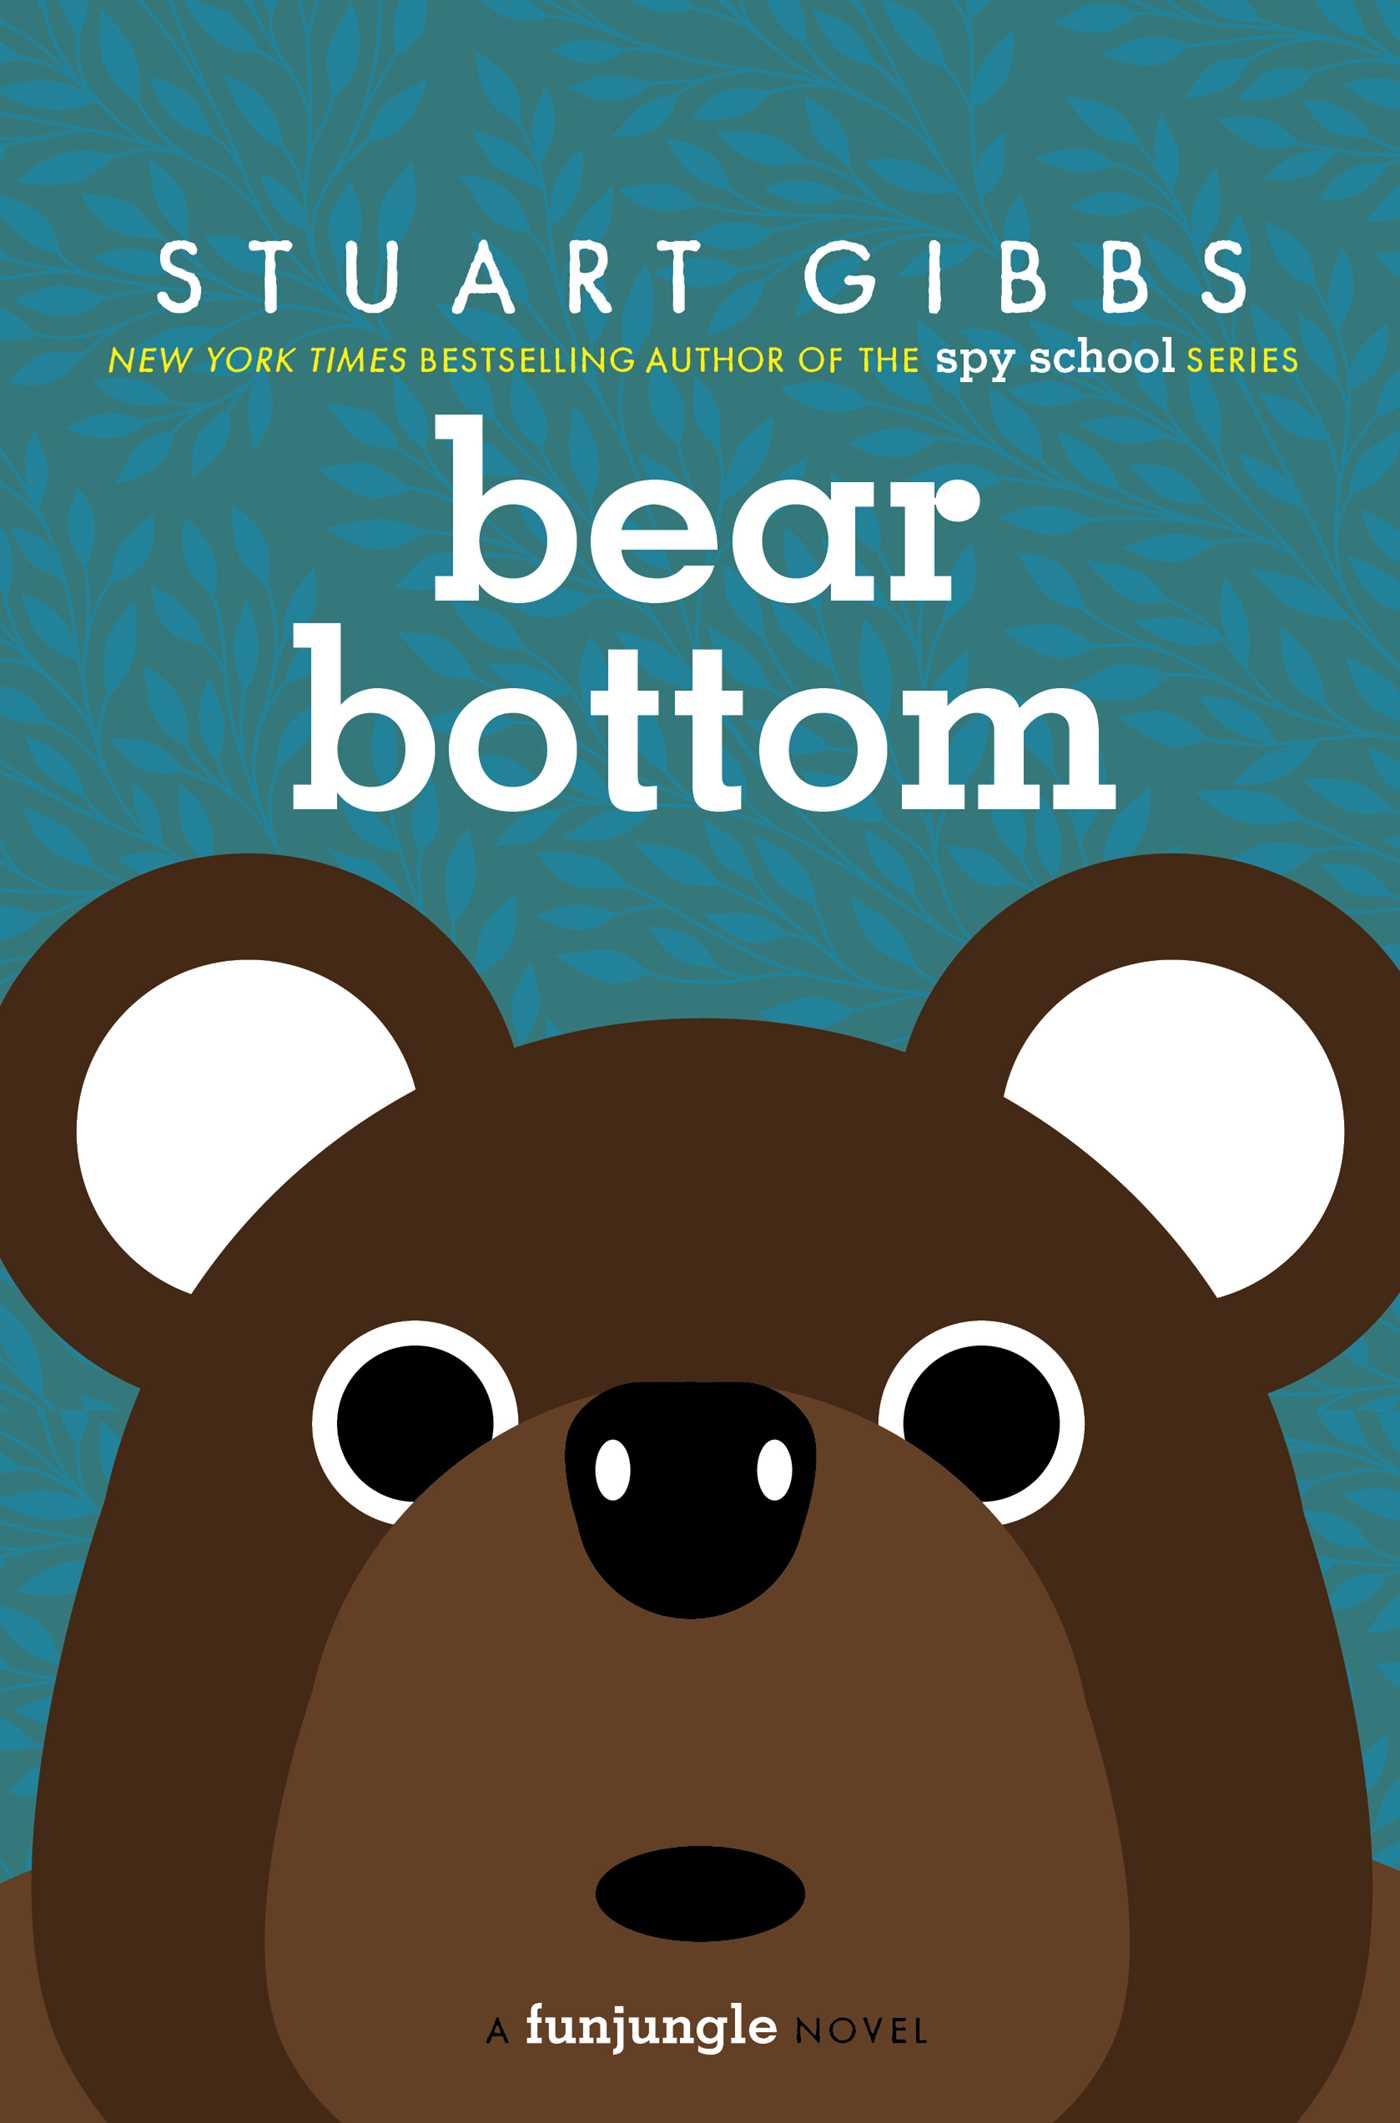 Bear Bottom (FunJungle, #7)